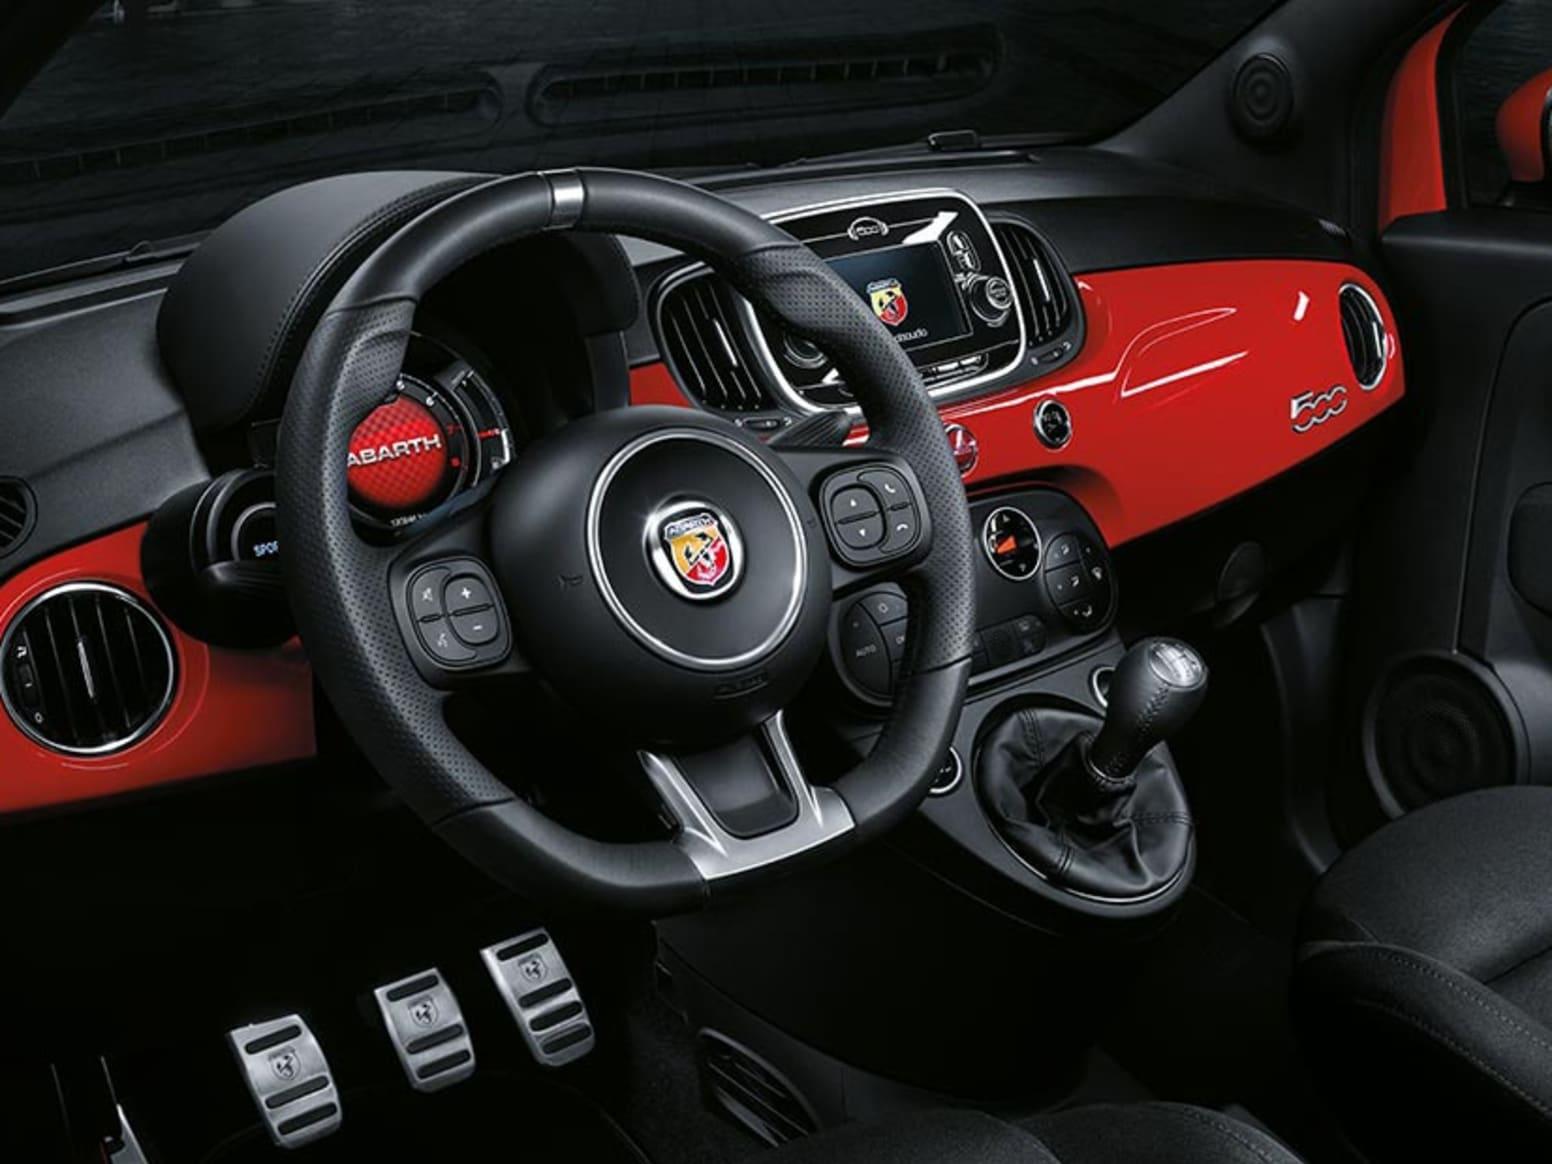 Abarth 595 Interior Steering Wheel